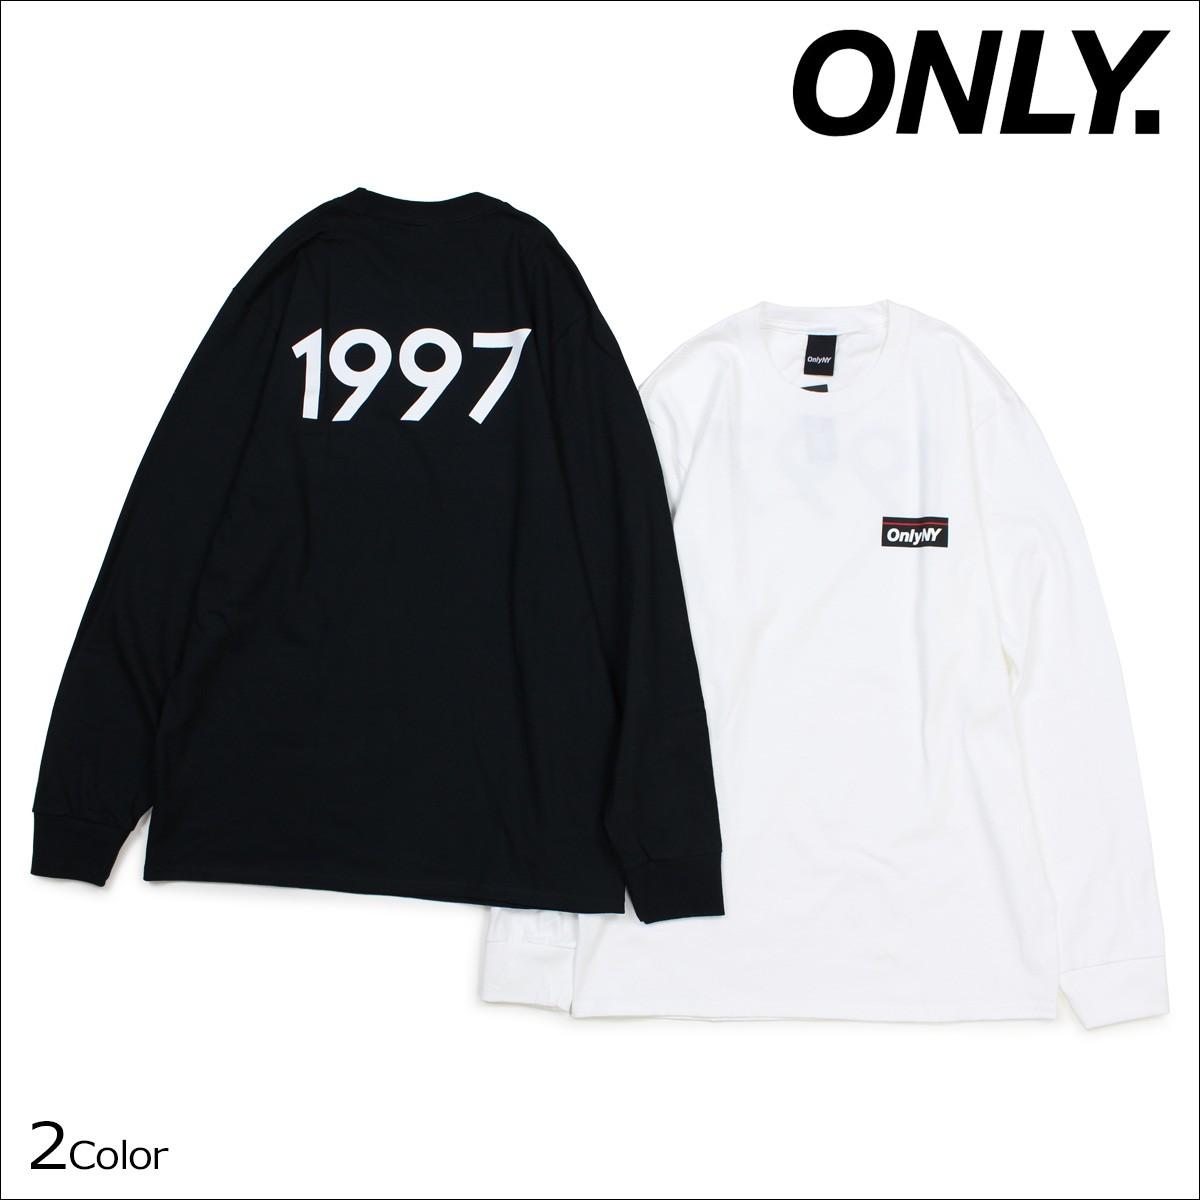 ONLY NY オンリーニューヨーク Tシャツ メンズ 長袖 カットソー SUBWAY L/S T-SHIRT ロンティー ロンT コットン ブラック ホワイト [12/22 新入荷]